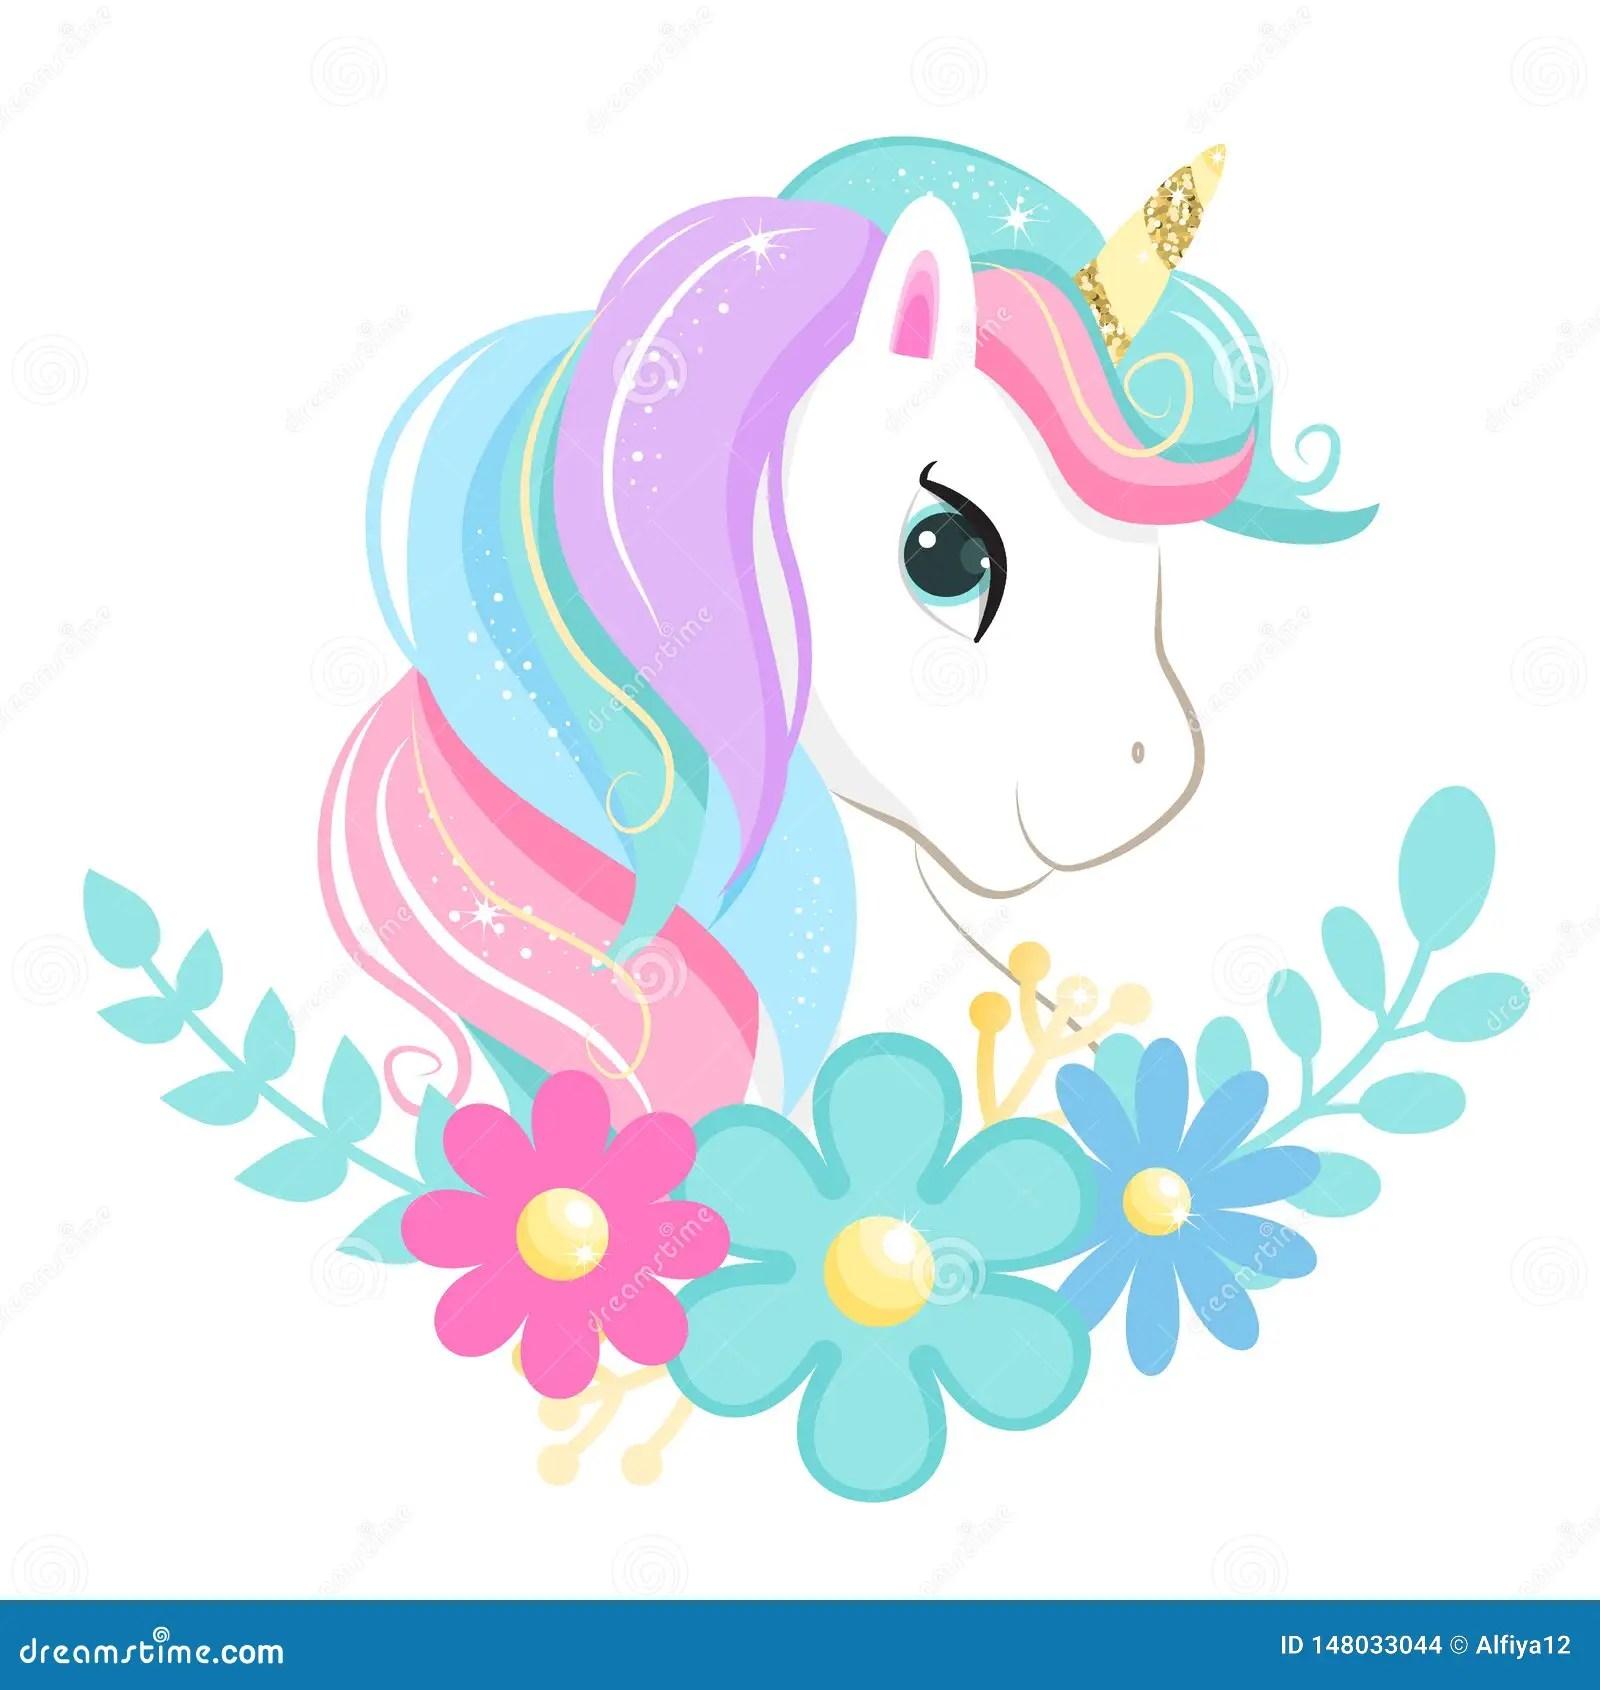 Cute Magic Cartoon Unicorn Head With Flowers Illustration